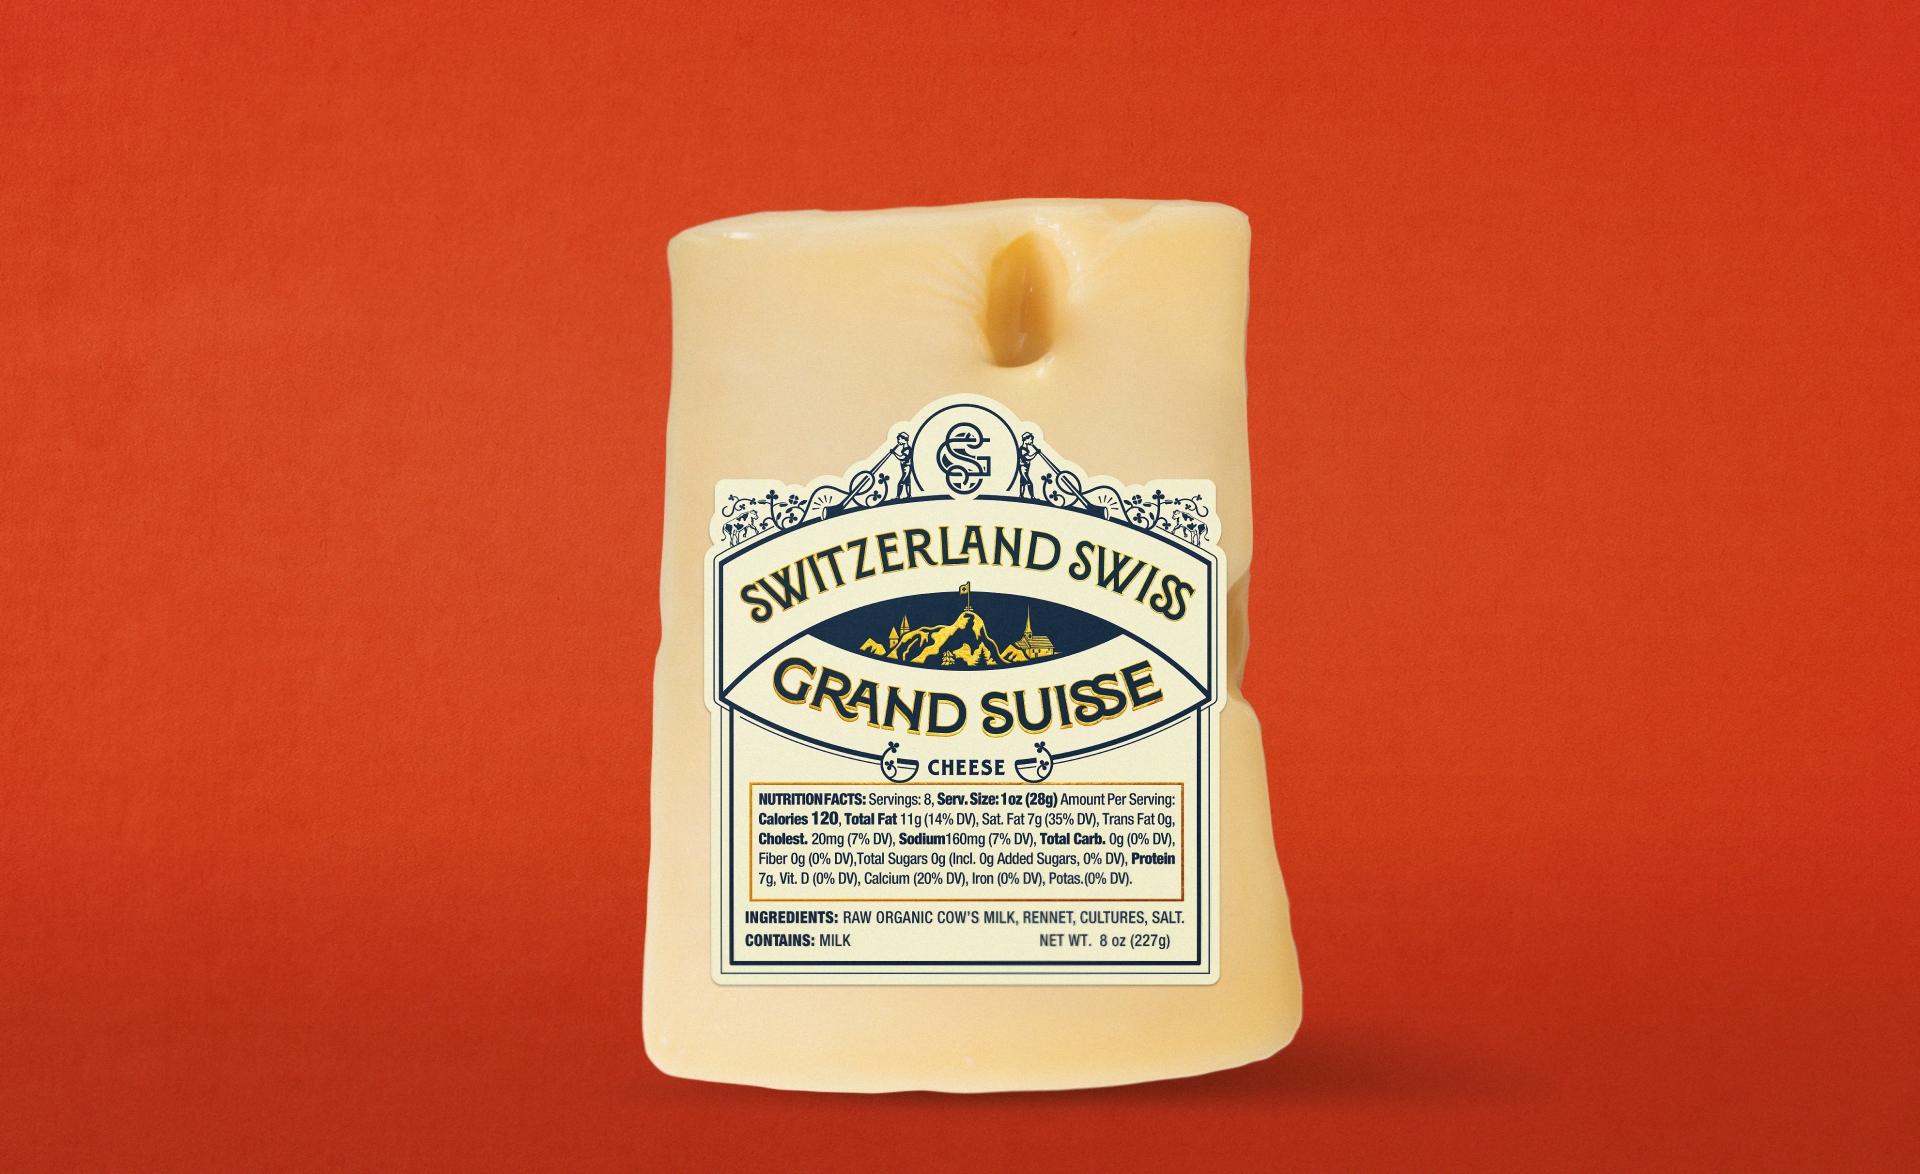 label-cheese-switzerland-preview-grand-suisse-close-zeki-michael-design-branding-studio-packaging-red copy